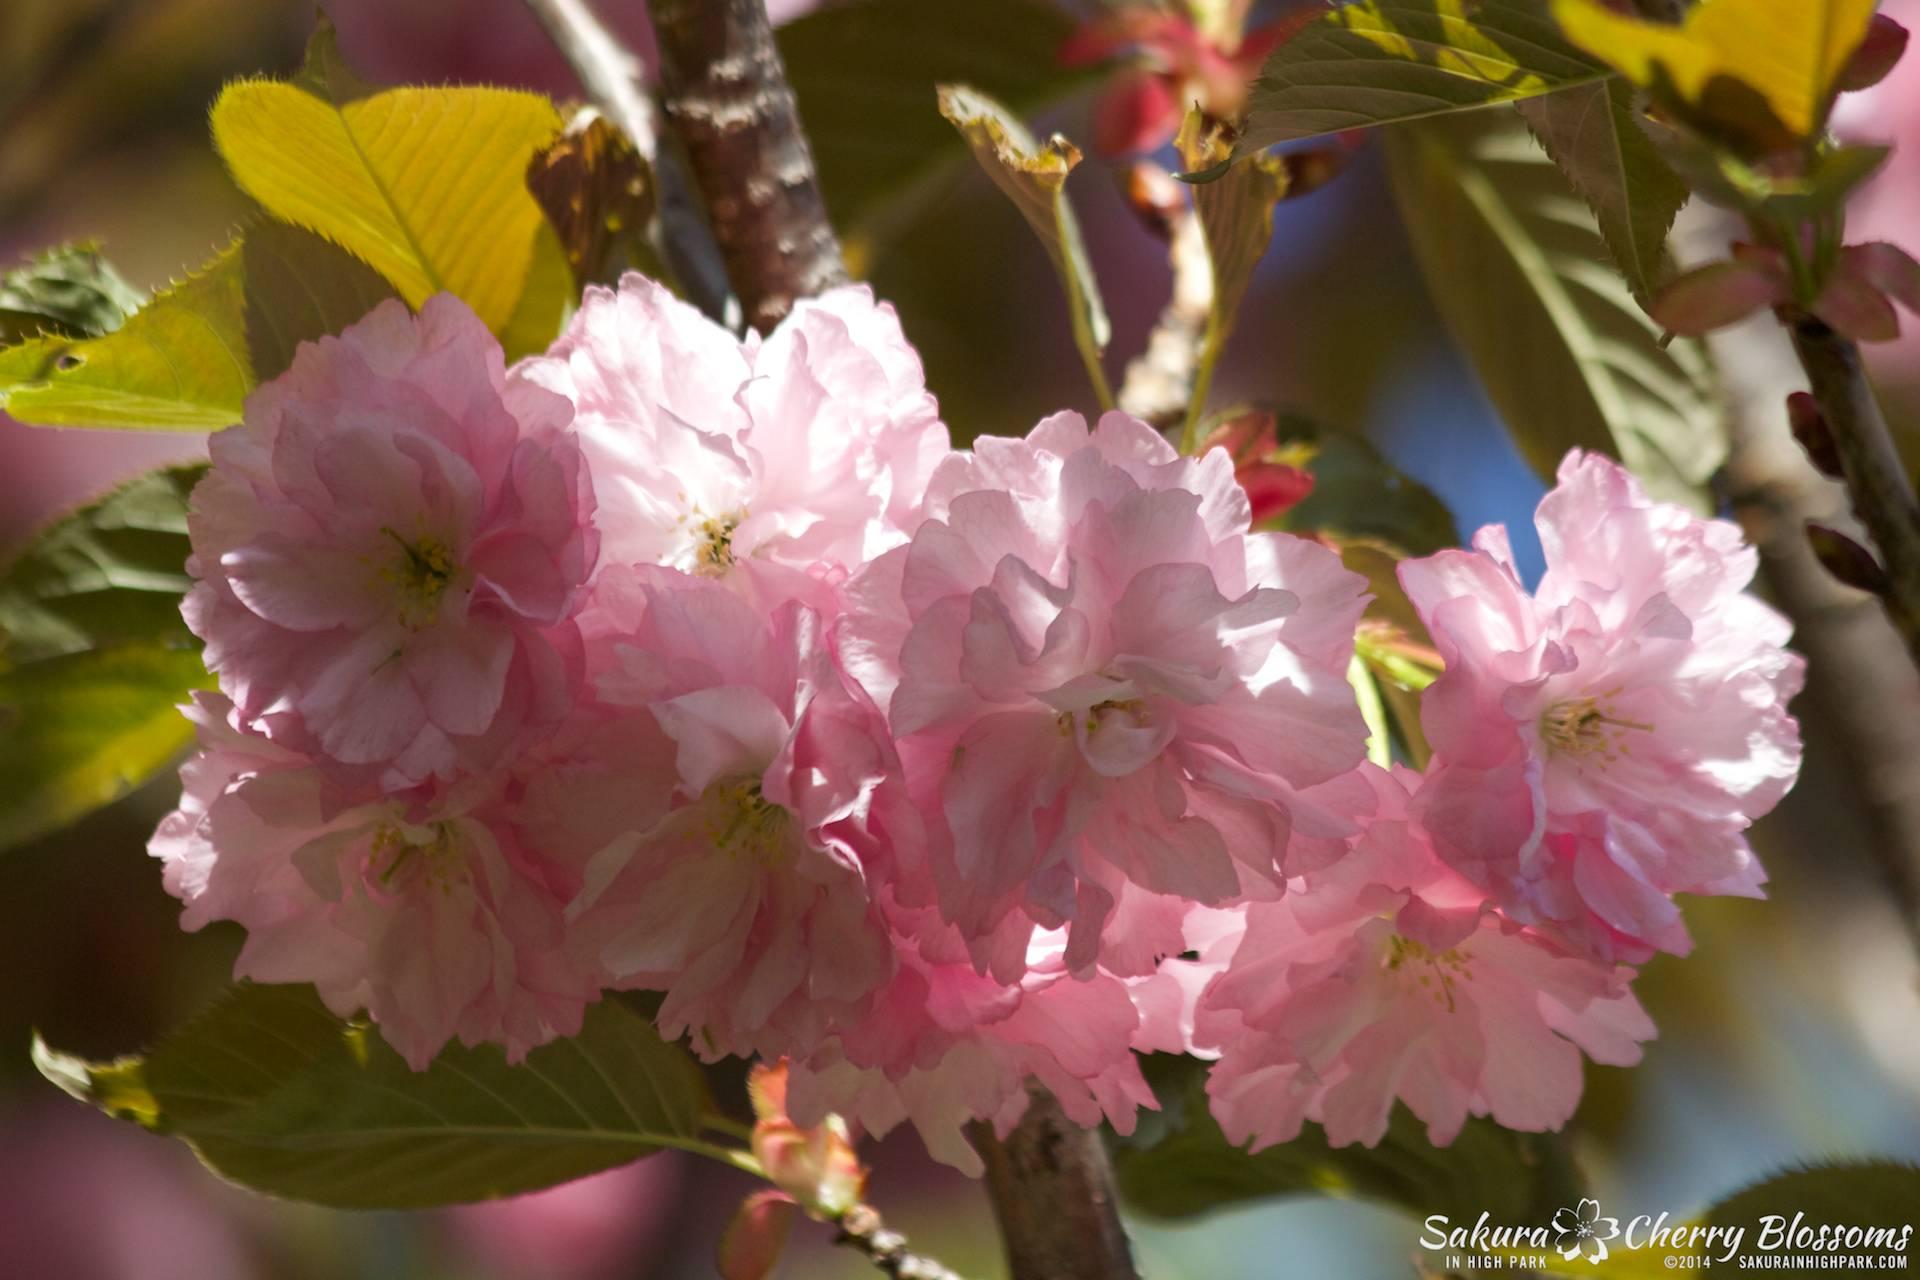 SakuraInHighPark-May2414-503.jpg